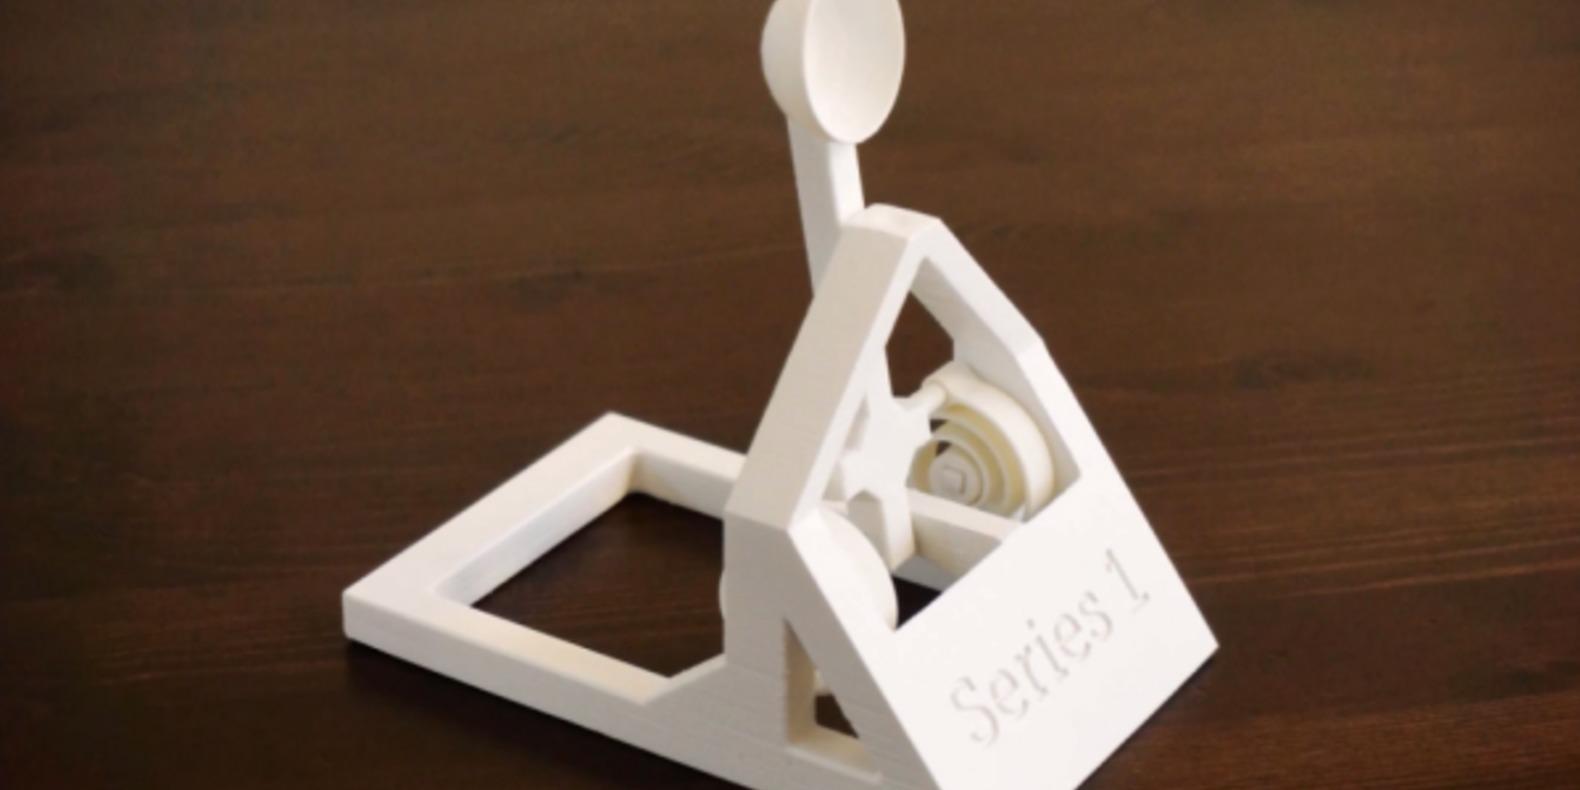 cults jouet catapulte fichier 3D Ponoko imprimante 3D